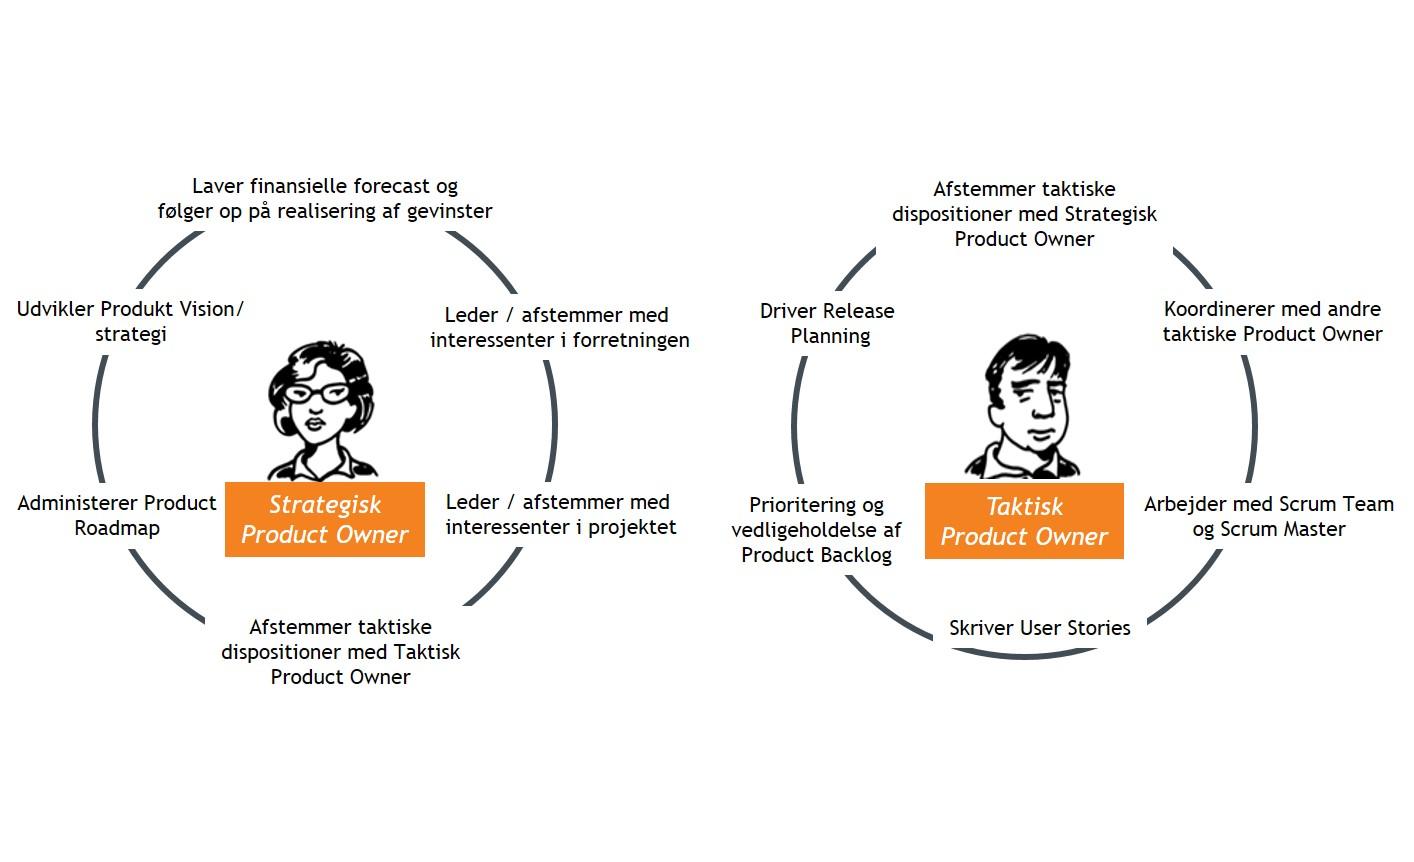 Strategisk og taktisk product owner